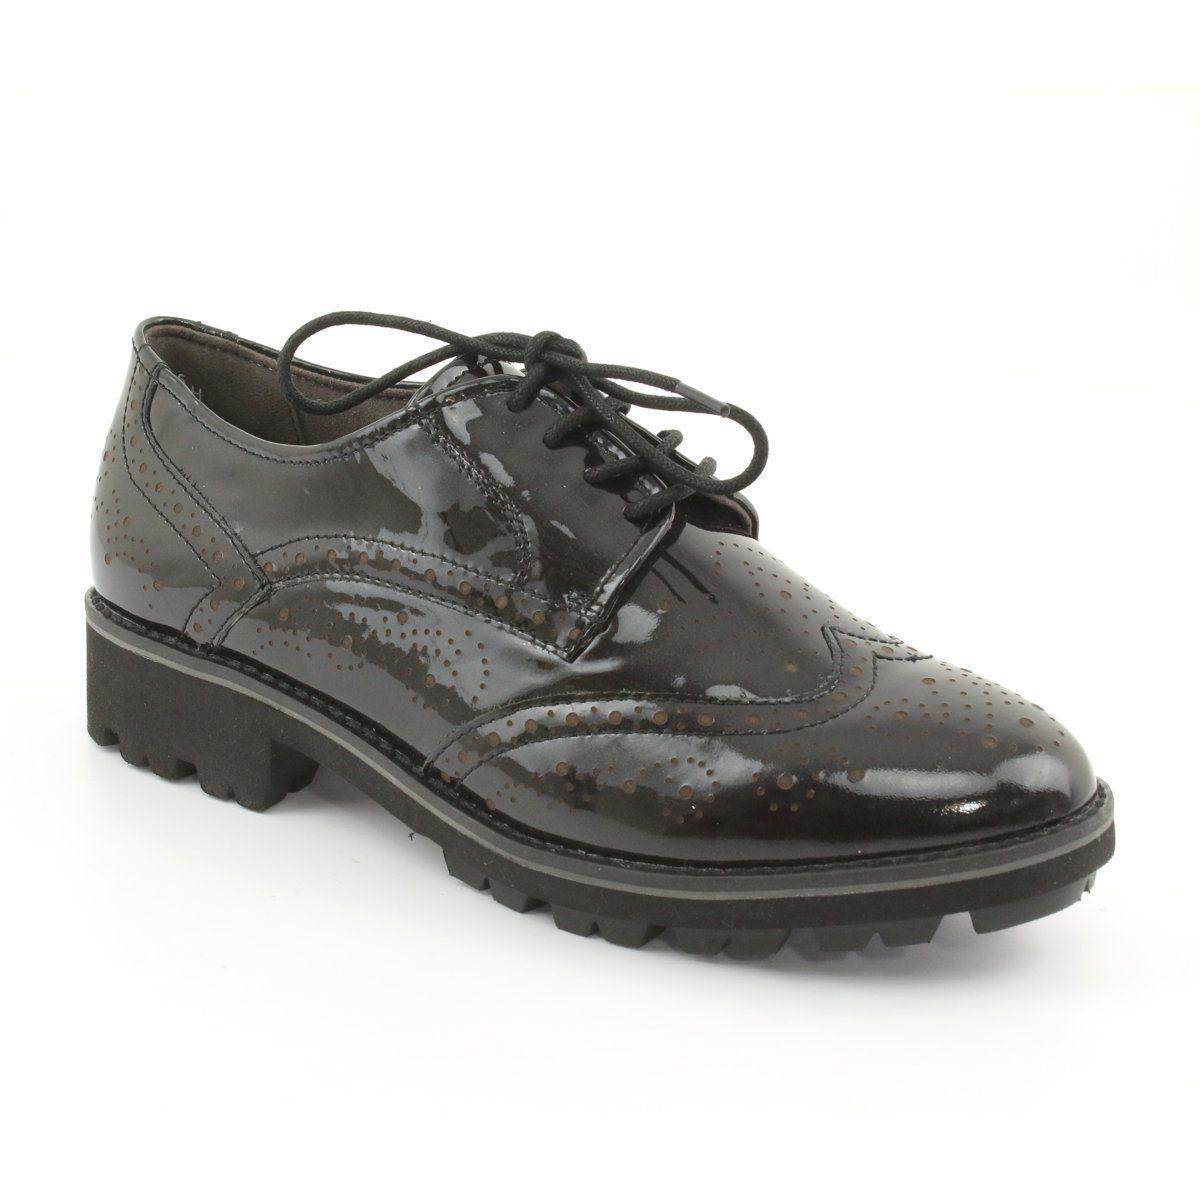 Oksfordki Polbuty Sznurowane Caprice 23701 Czarne Wielokolorowe Oxford Shoes Women Shoes Shoes